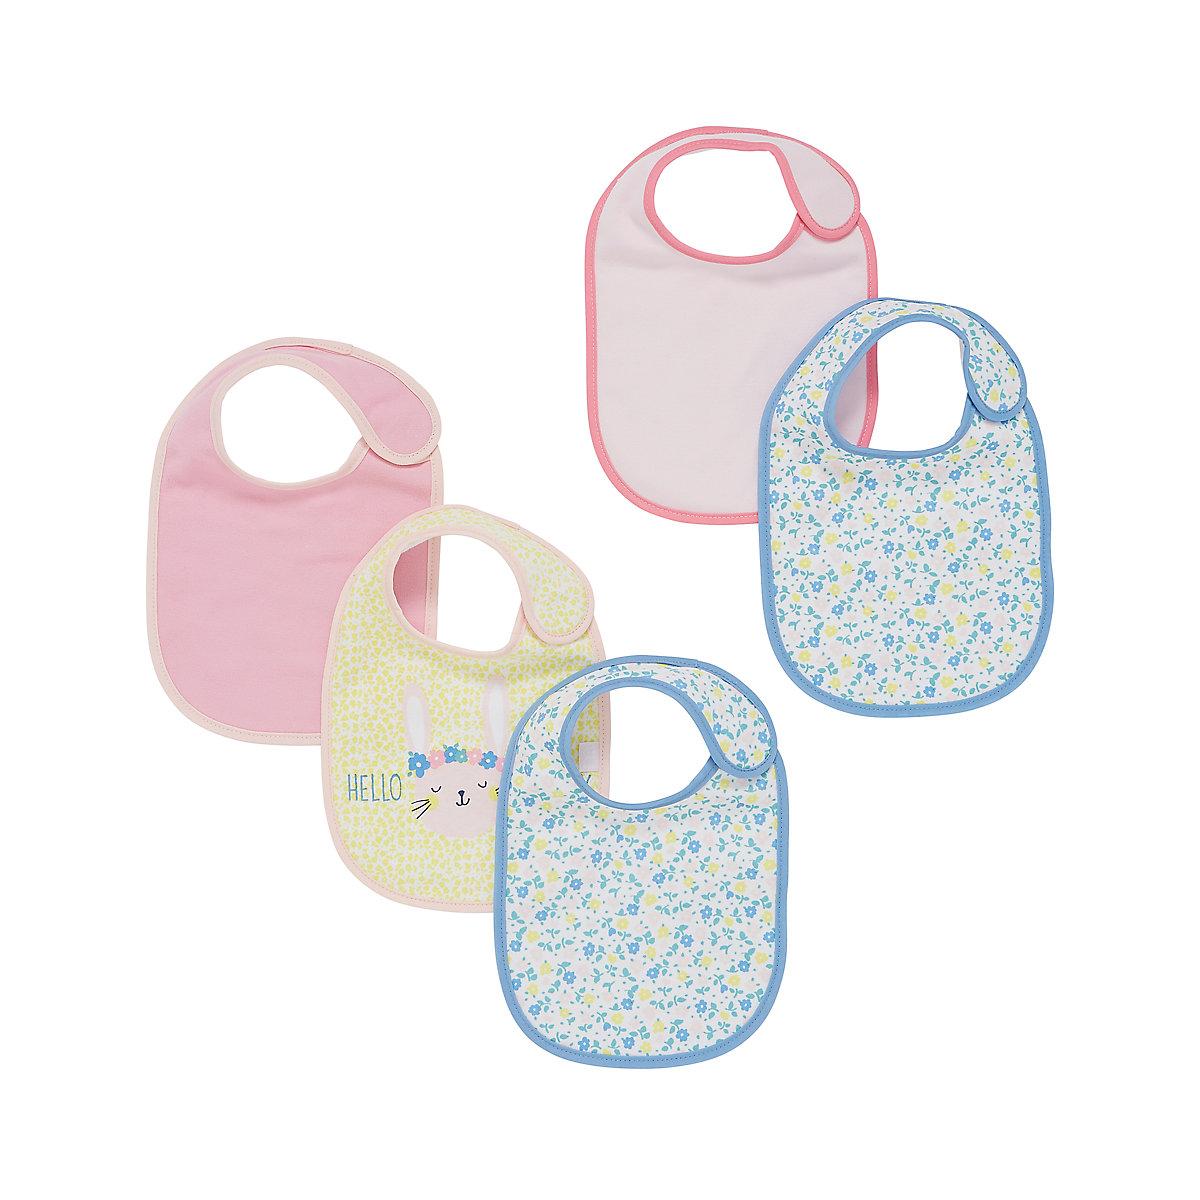 mothercare newborn bunny bibs - 5 pack